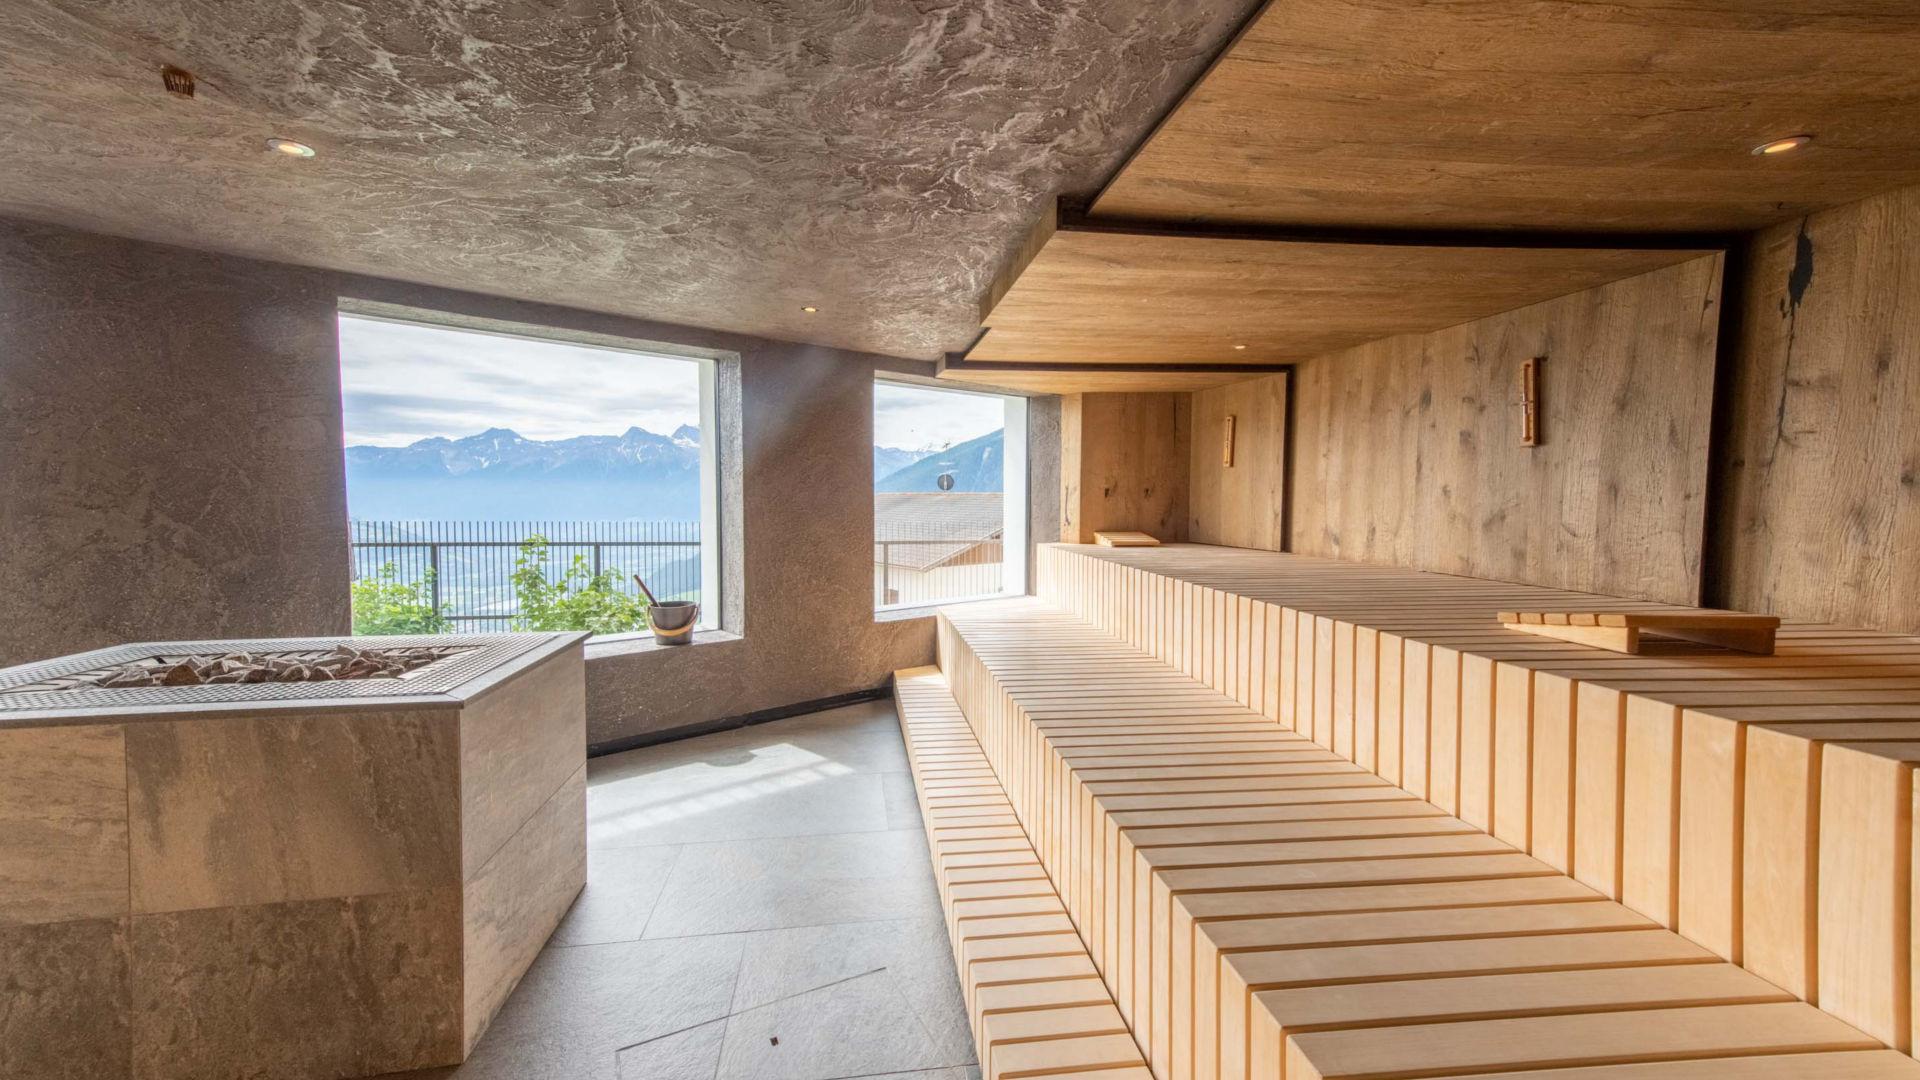 Sauna Panoramica nell'Hotel Benessere Watles in Alto Adige